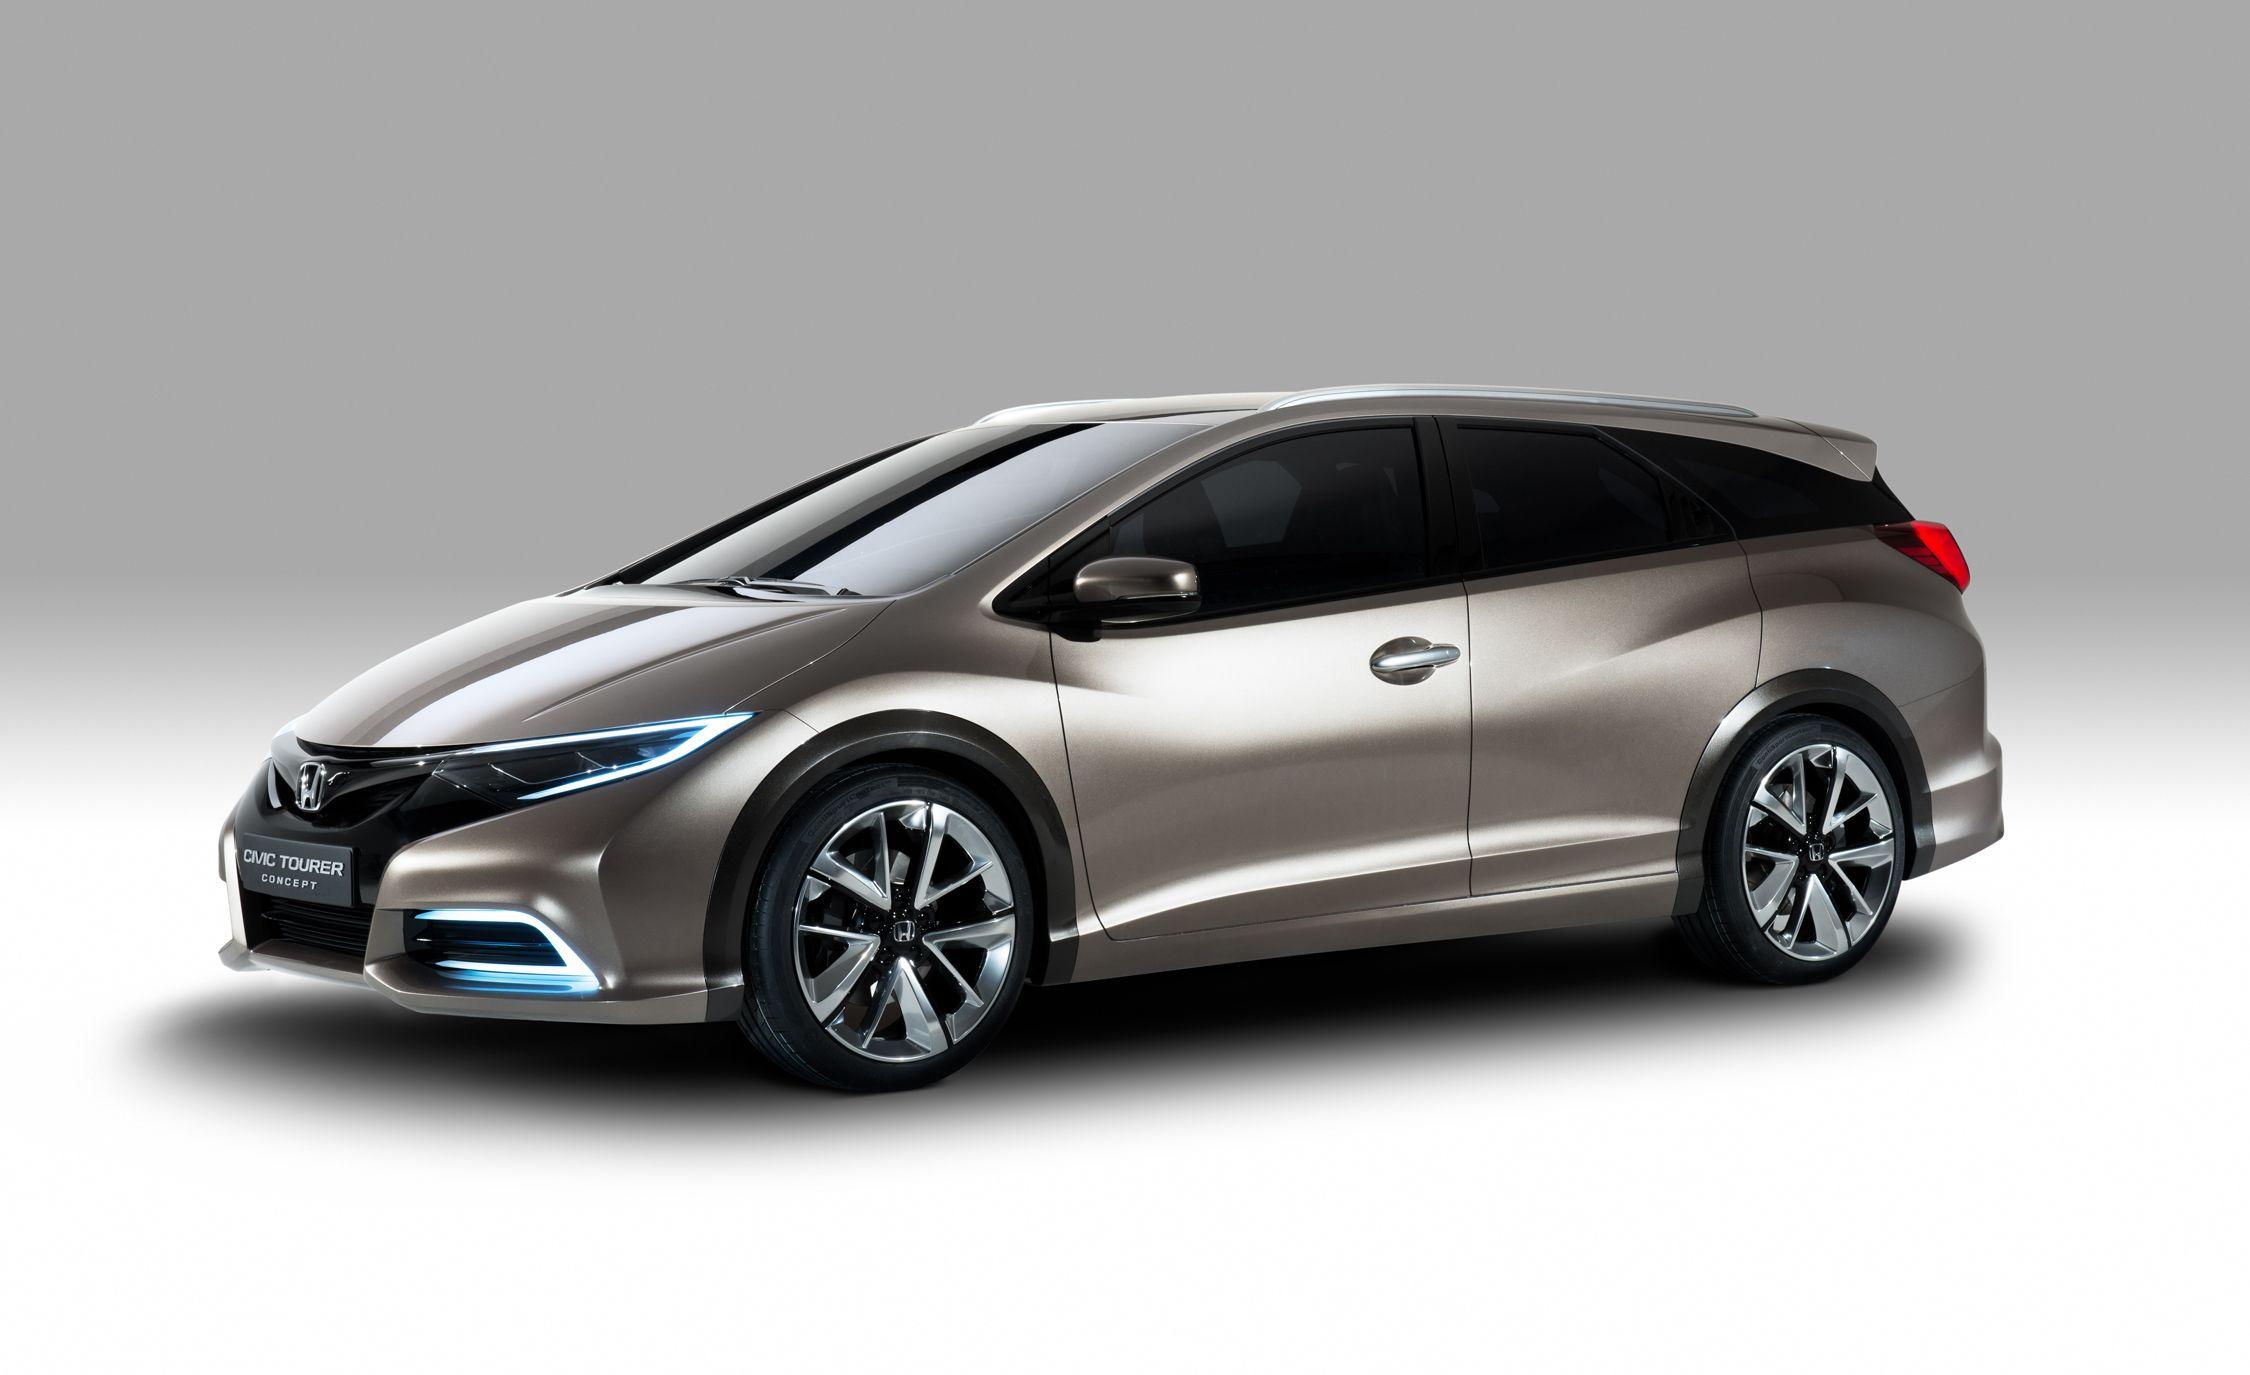 Honda Civic Tourer Concept: A Wagon for the Continent